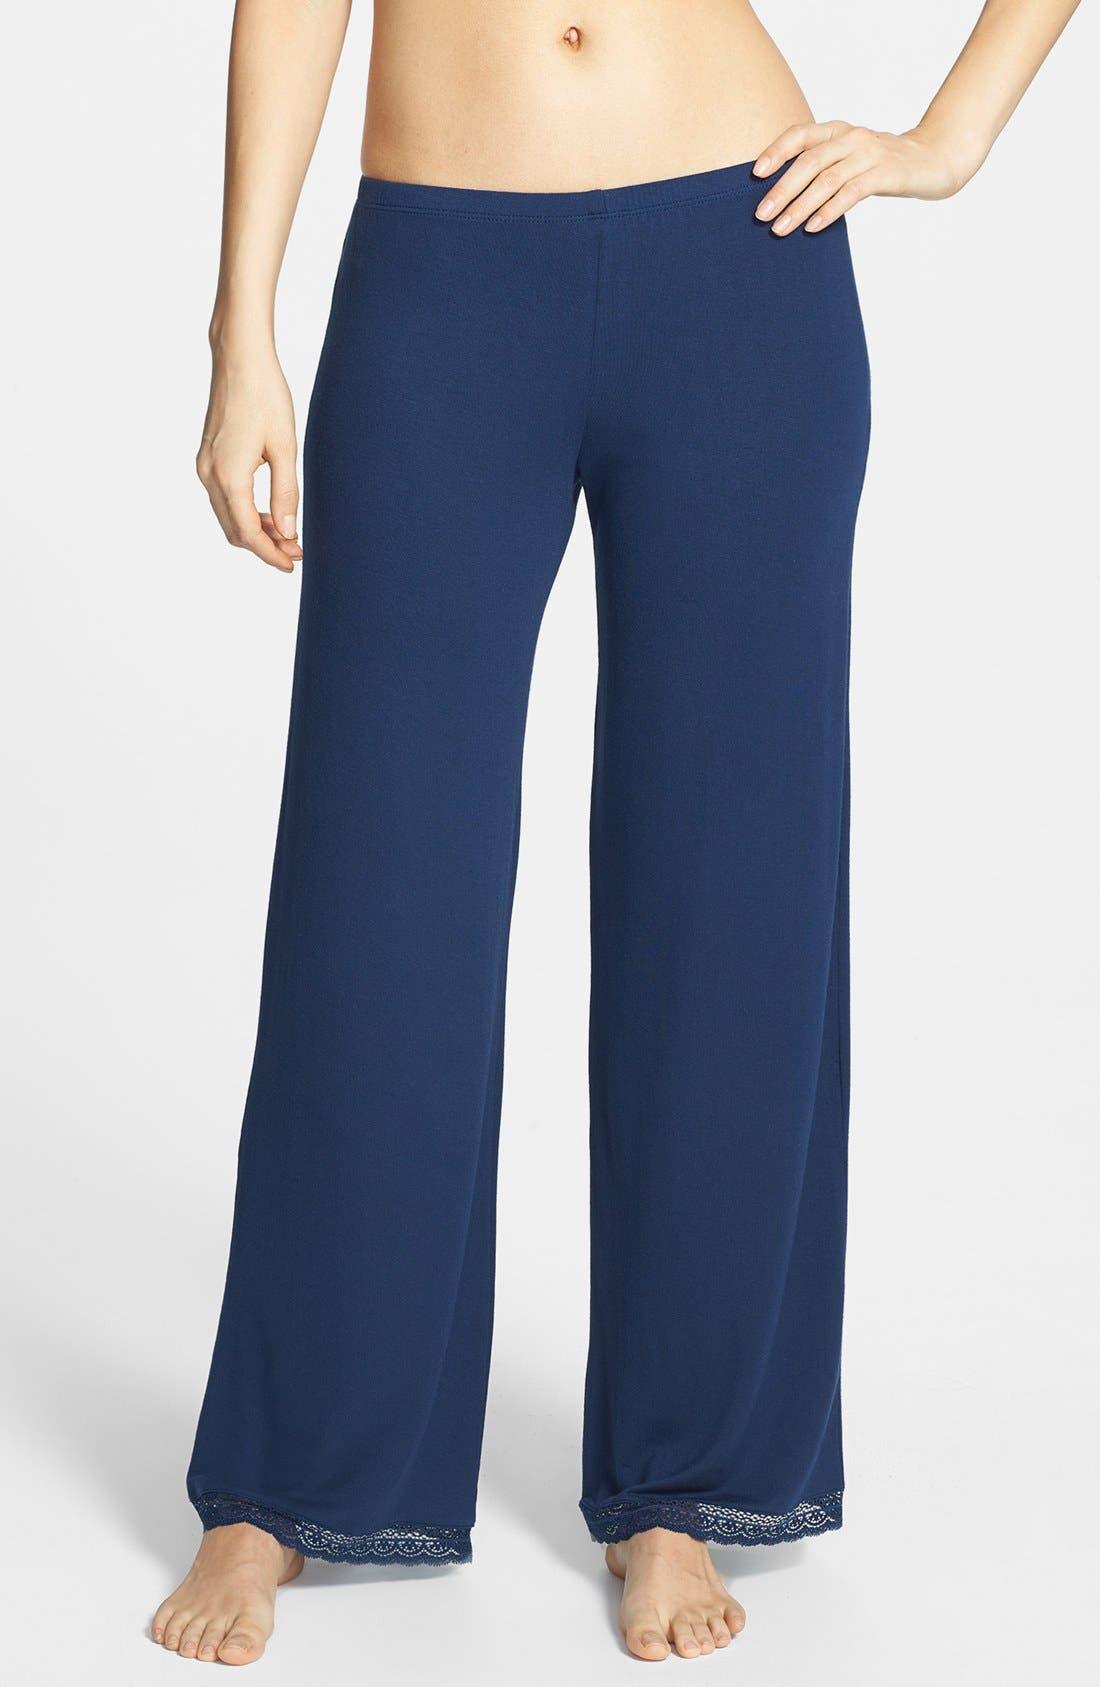 Main Image - Eberjey 'Gisele' Lace Jersey Pajama Pants